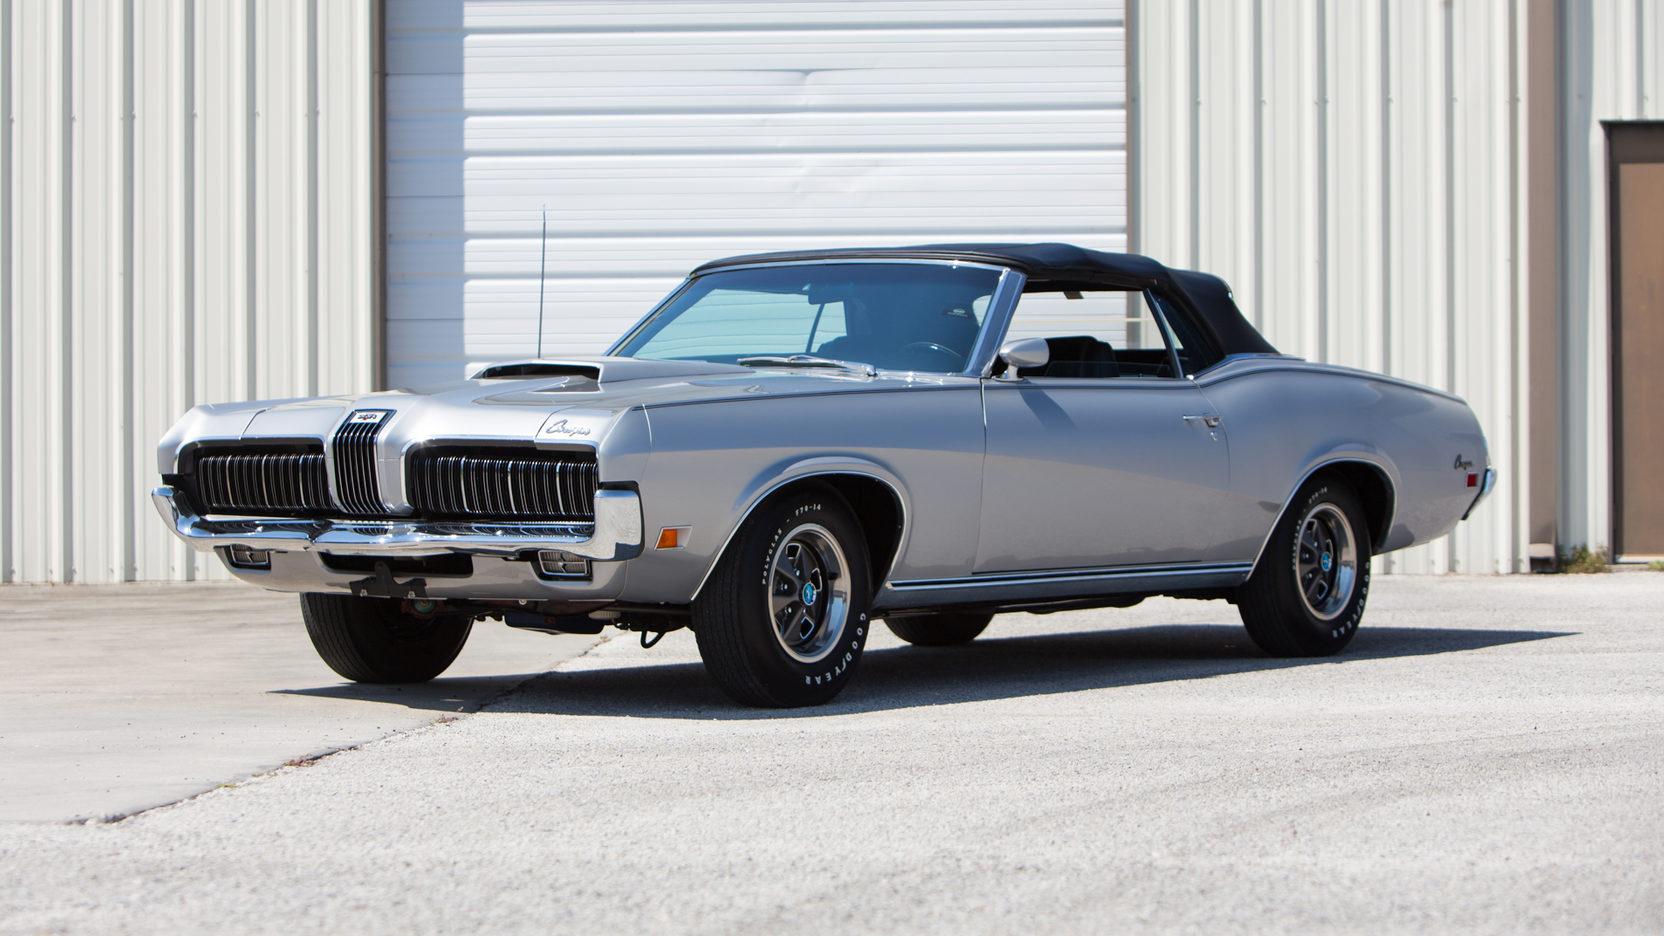 1970 Mercury Cougar XR-7 3/4 front